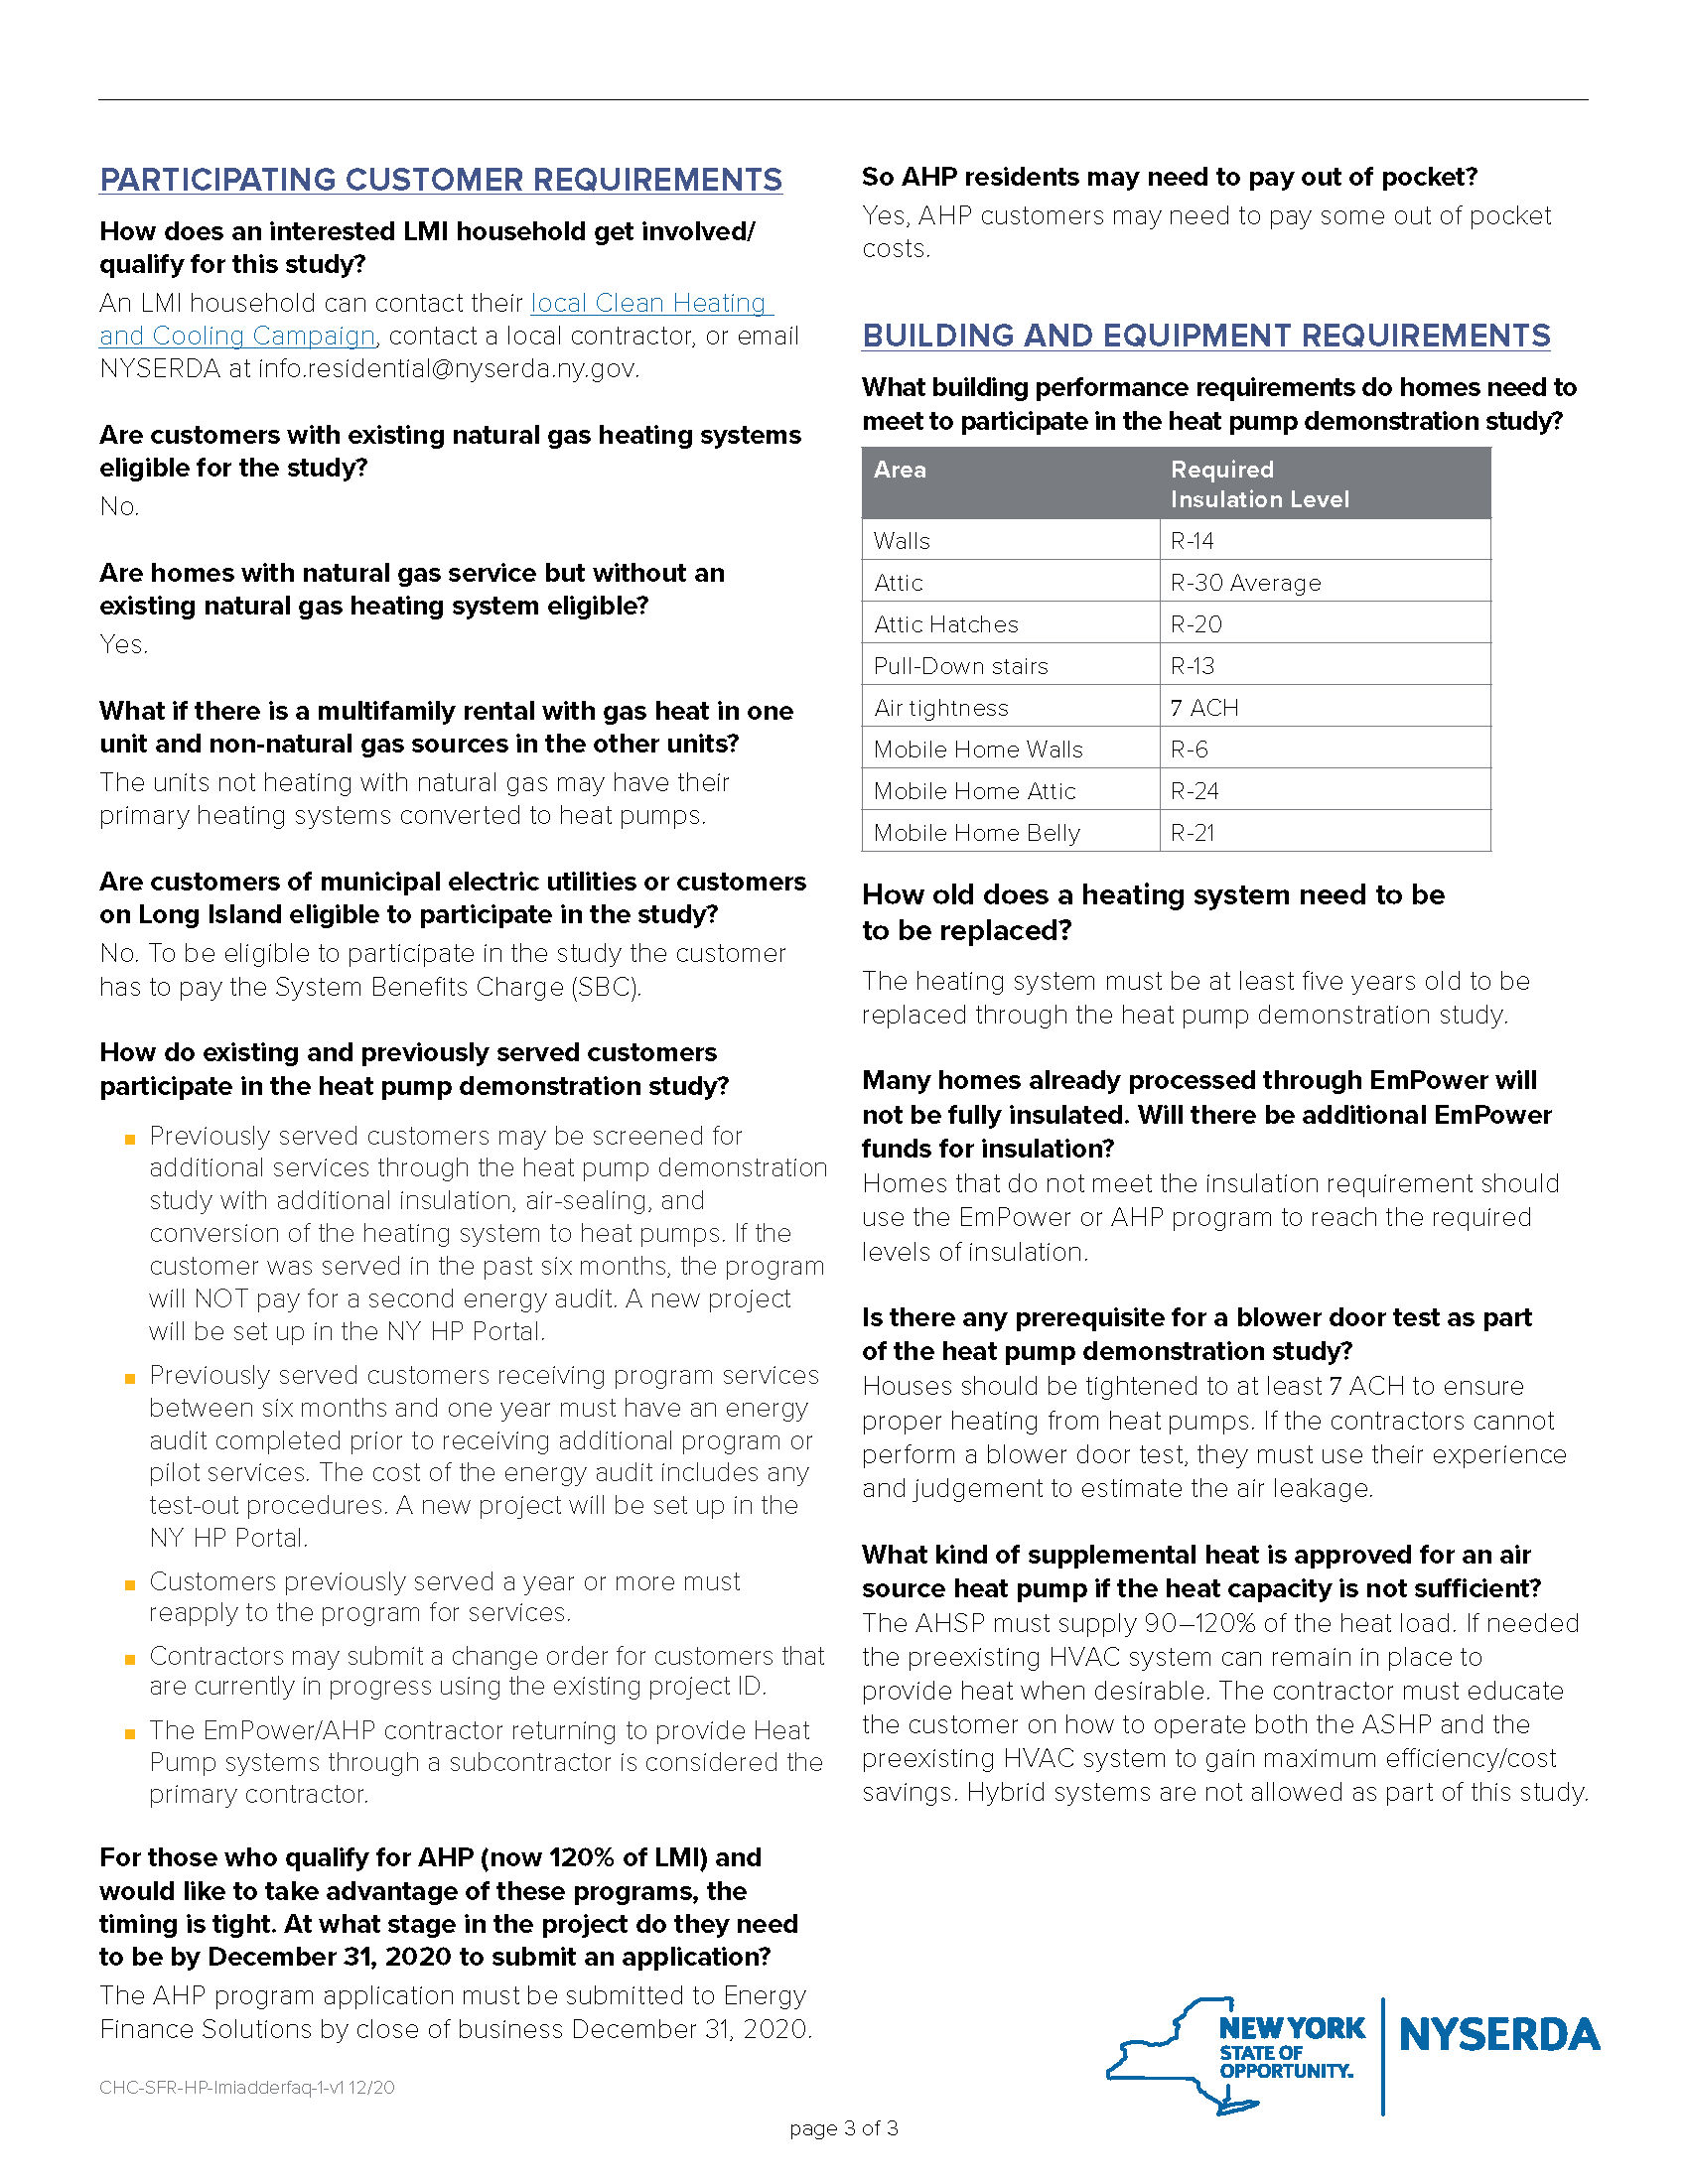 Heat Pump Demonstration Study